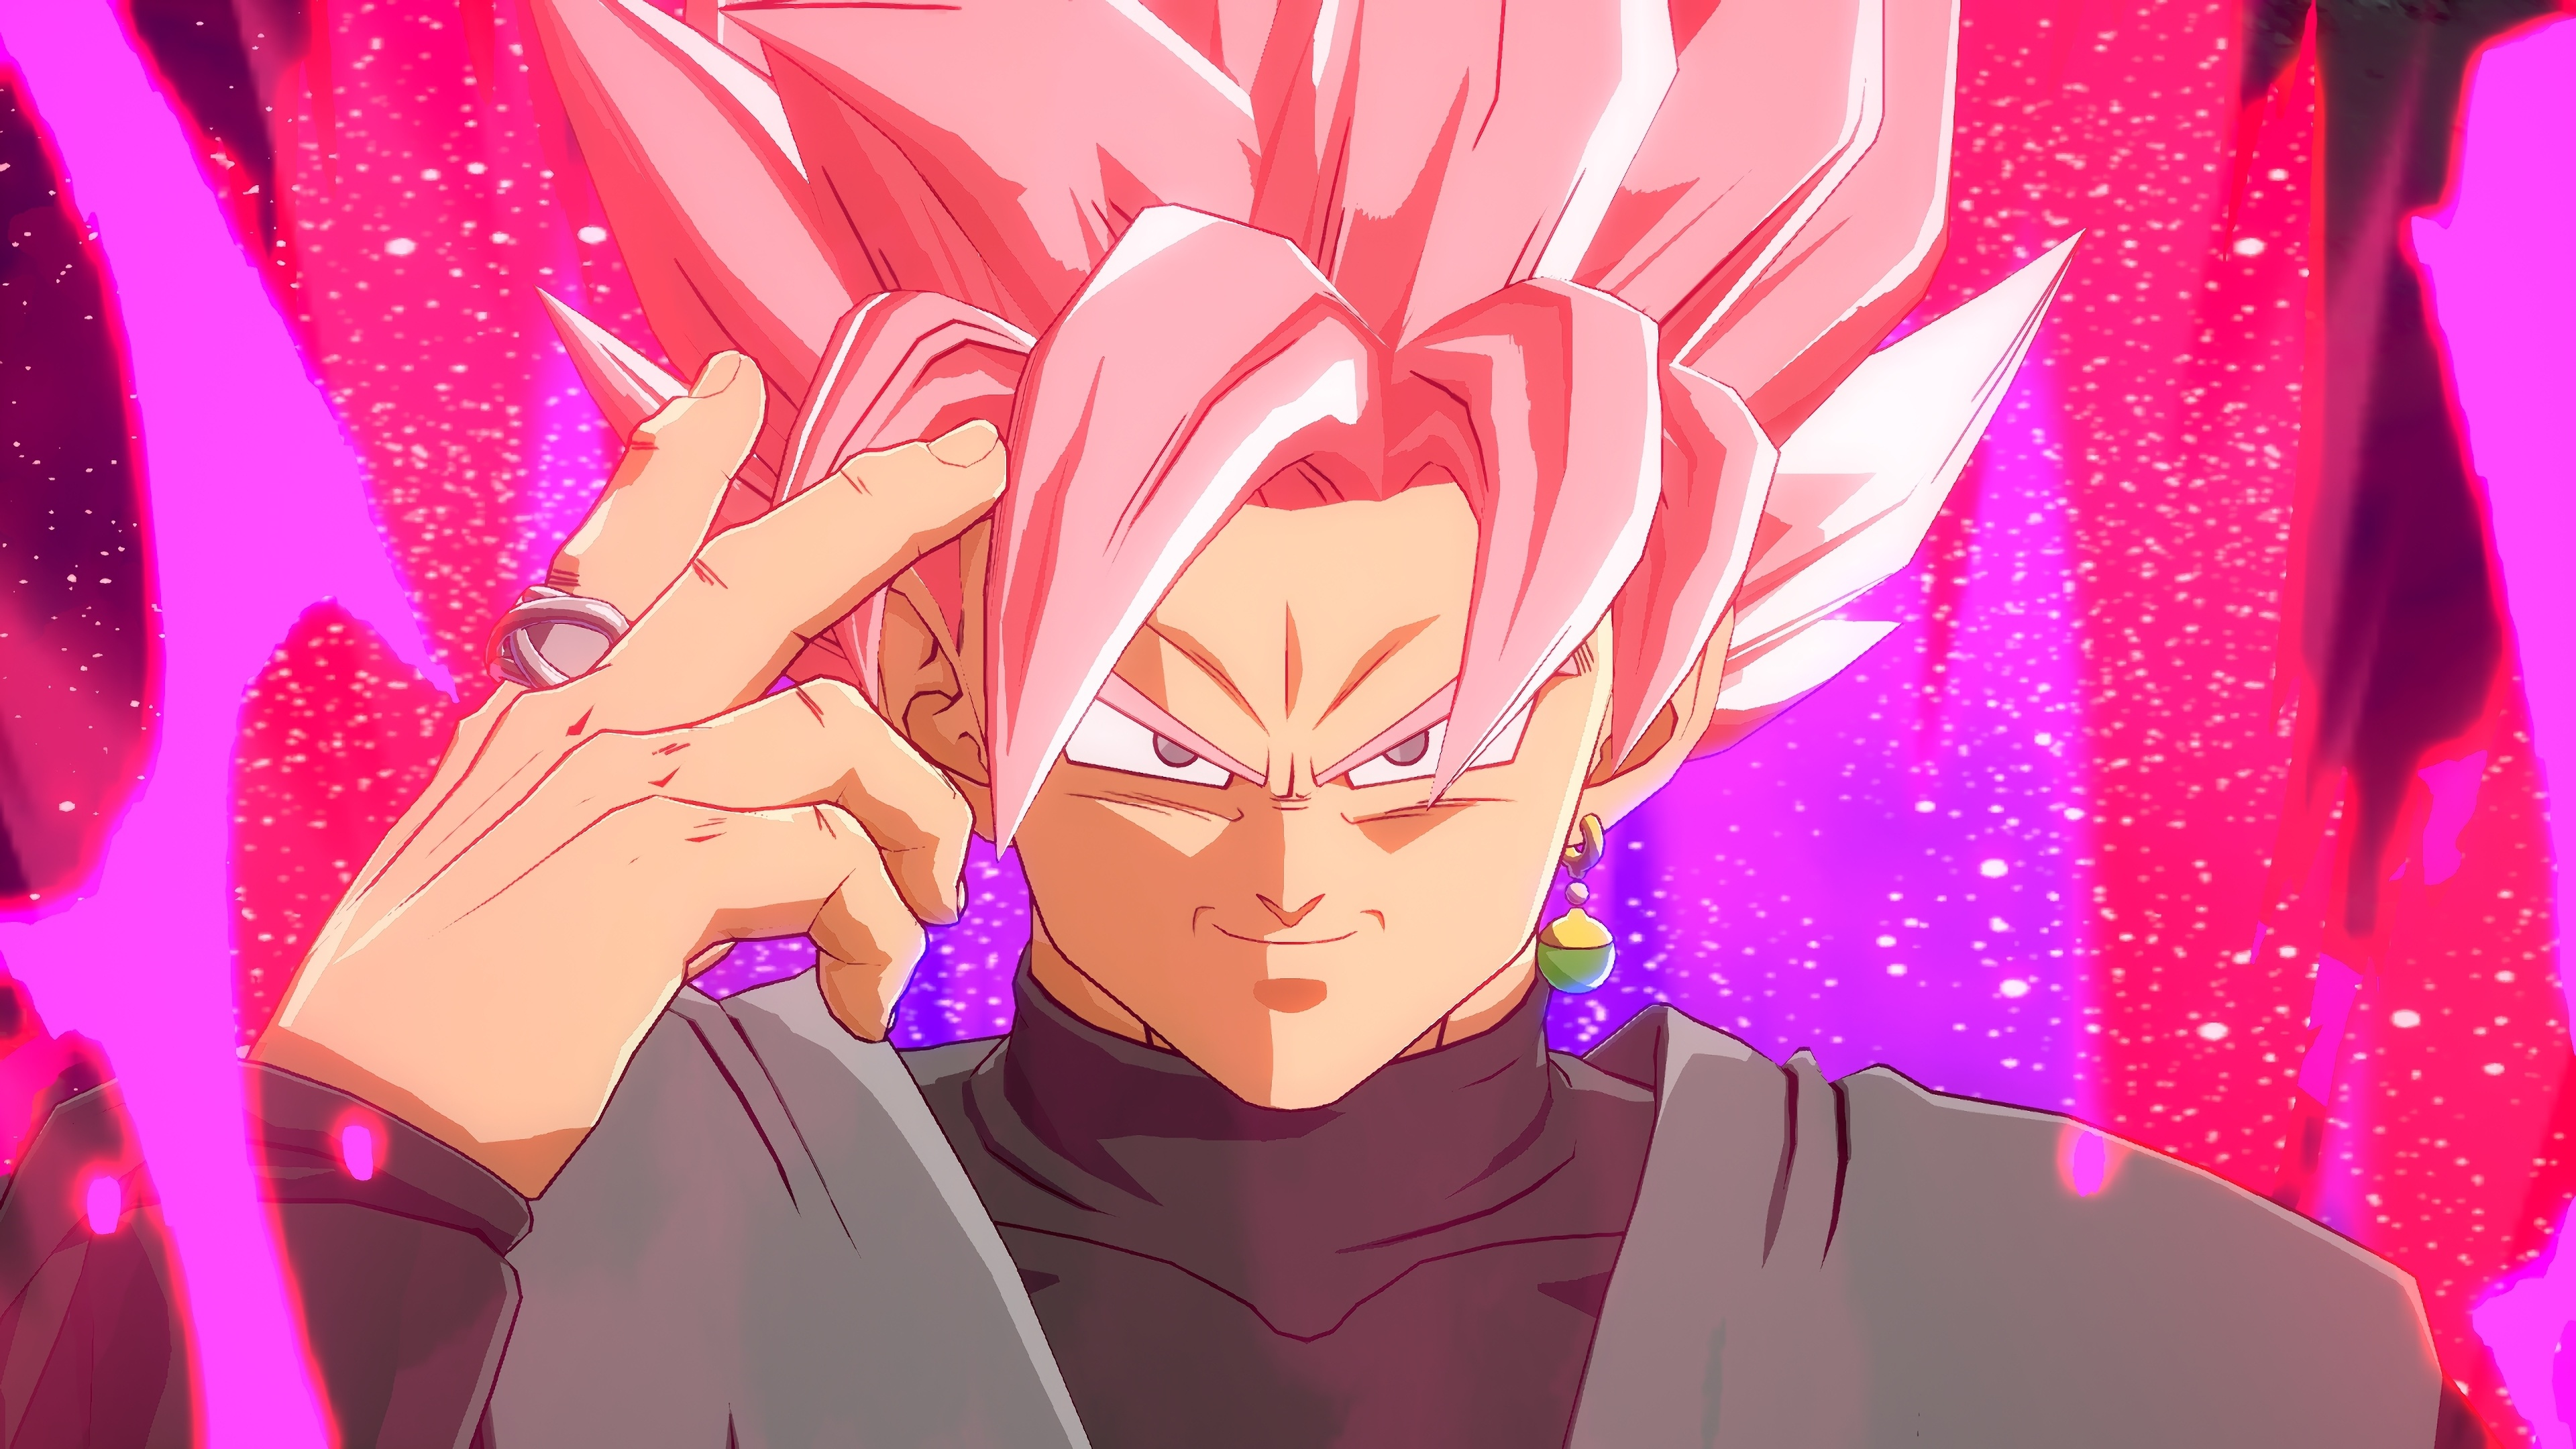 Download 3840x2400 Wallpaper Artwork Black Goku Dragon Ball Super 4k Ultra Hd 16 10 Widescreen 3840x2400 Hd Image Background 6254